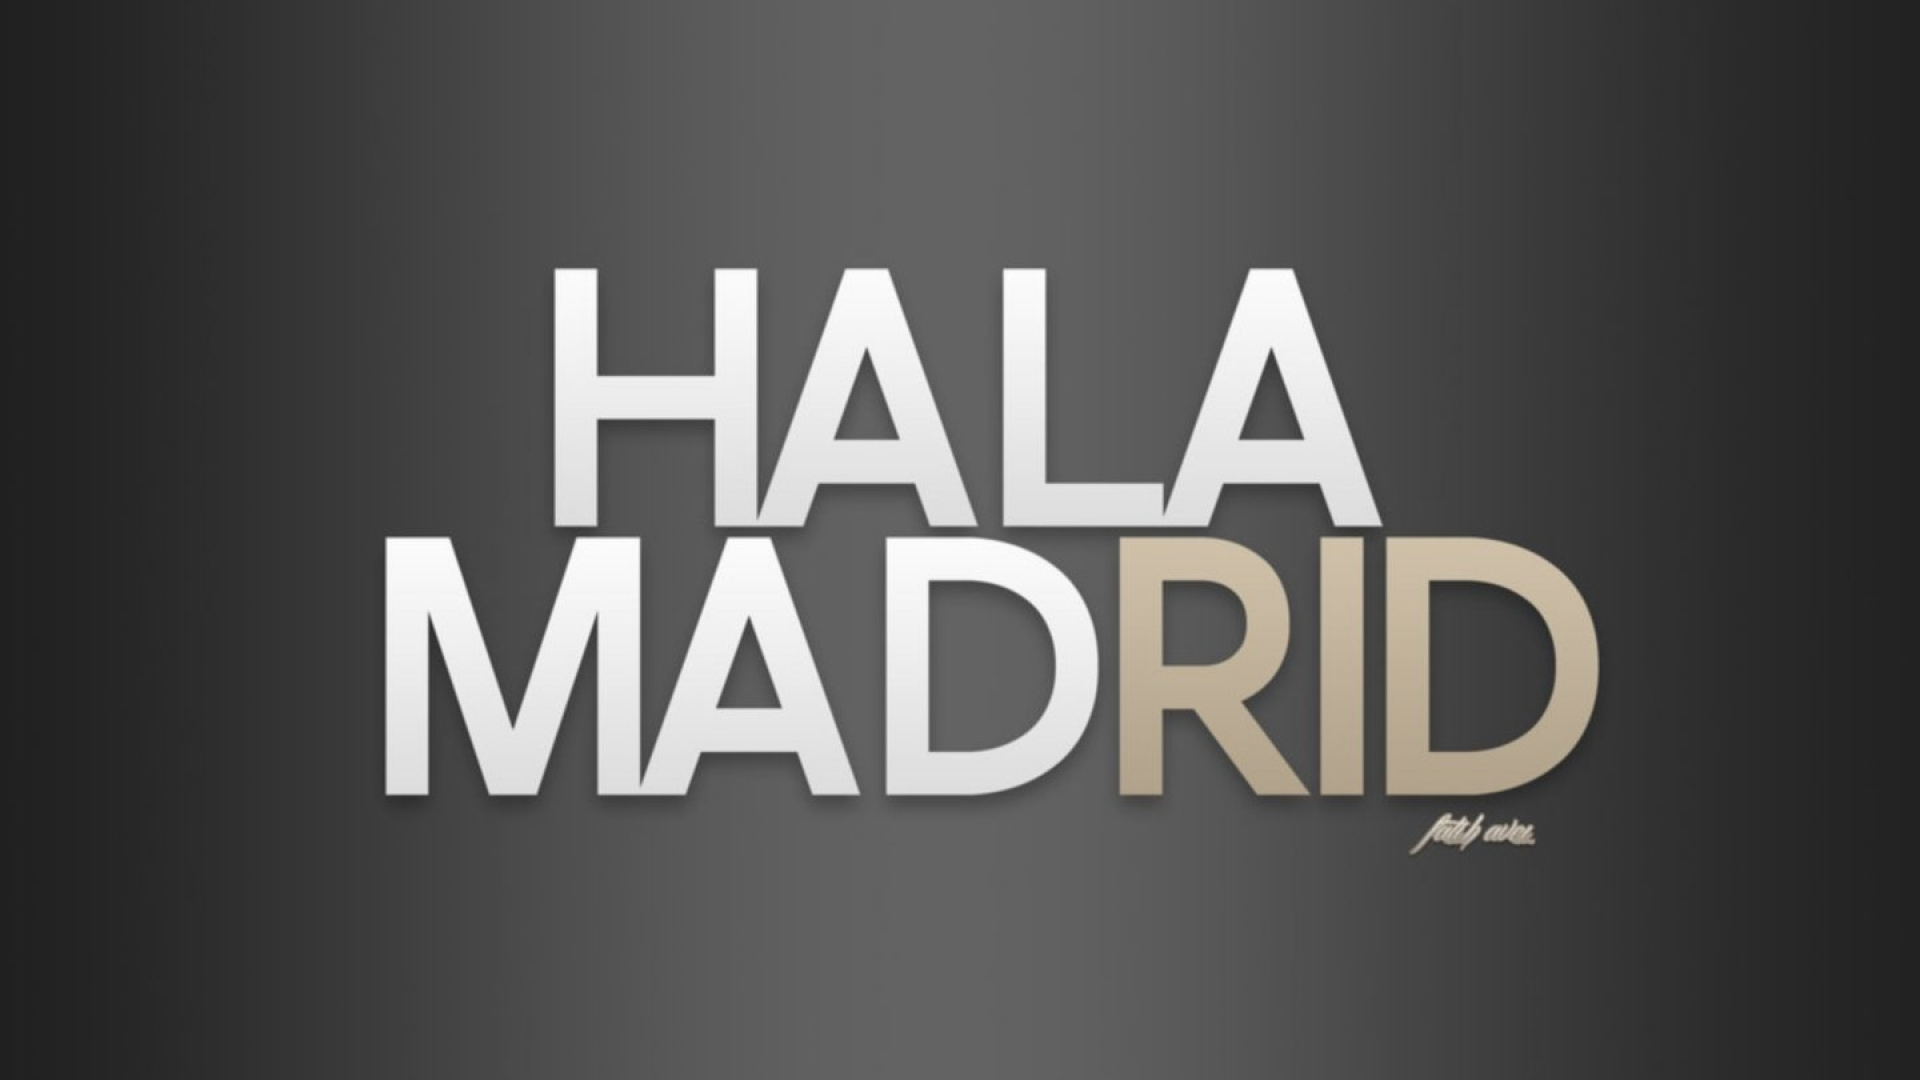 Real Madrid Iphone X Wallpaper Hala Madrid Wallpaper Hd Wallpapers